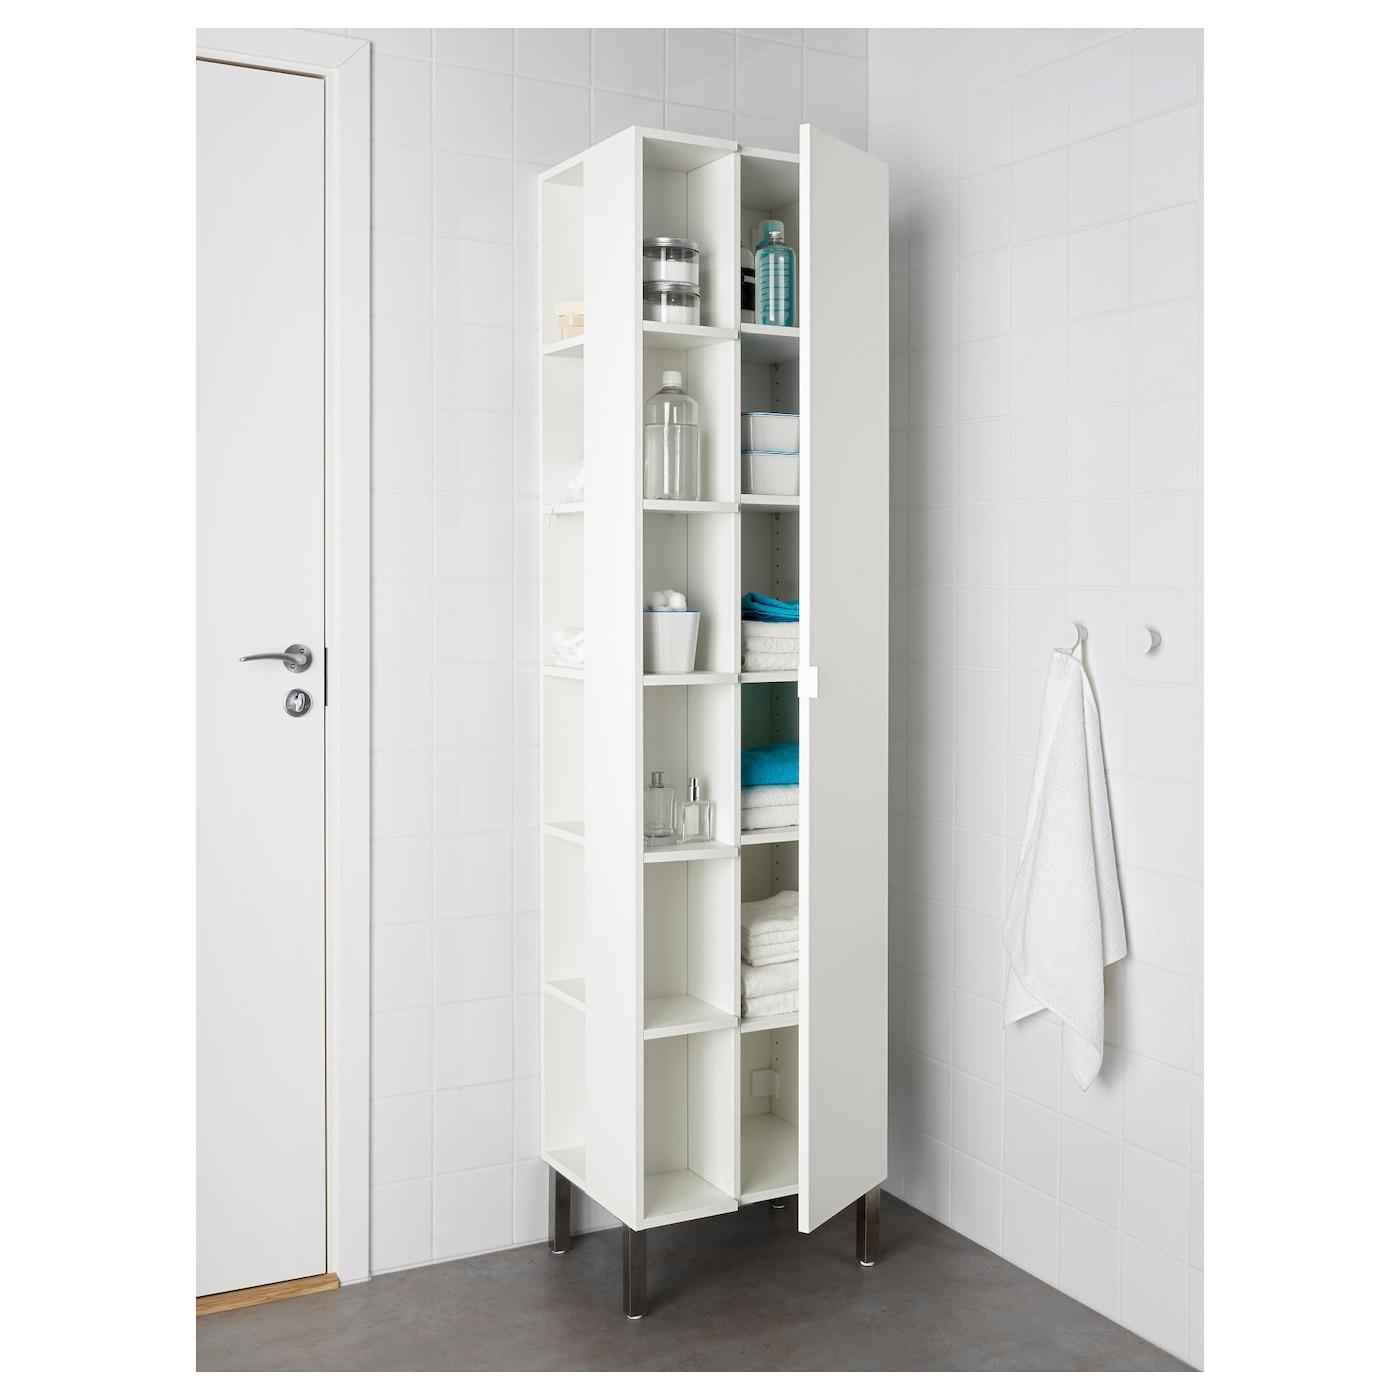 lill ngen high cabinet 1 door 2 end units white 49x38x194 cm ikea. Black Bedroom Furniture Sets. Home Design Ideas